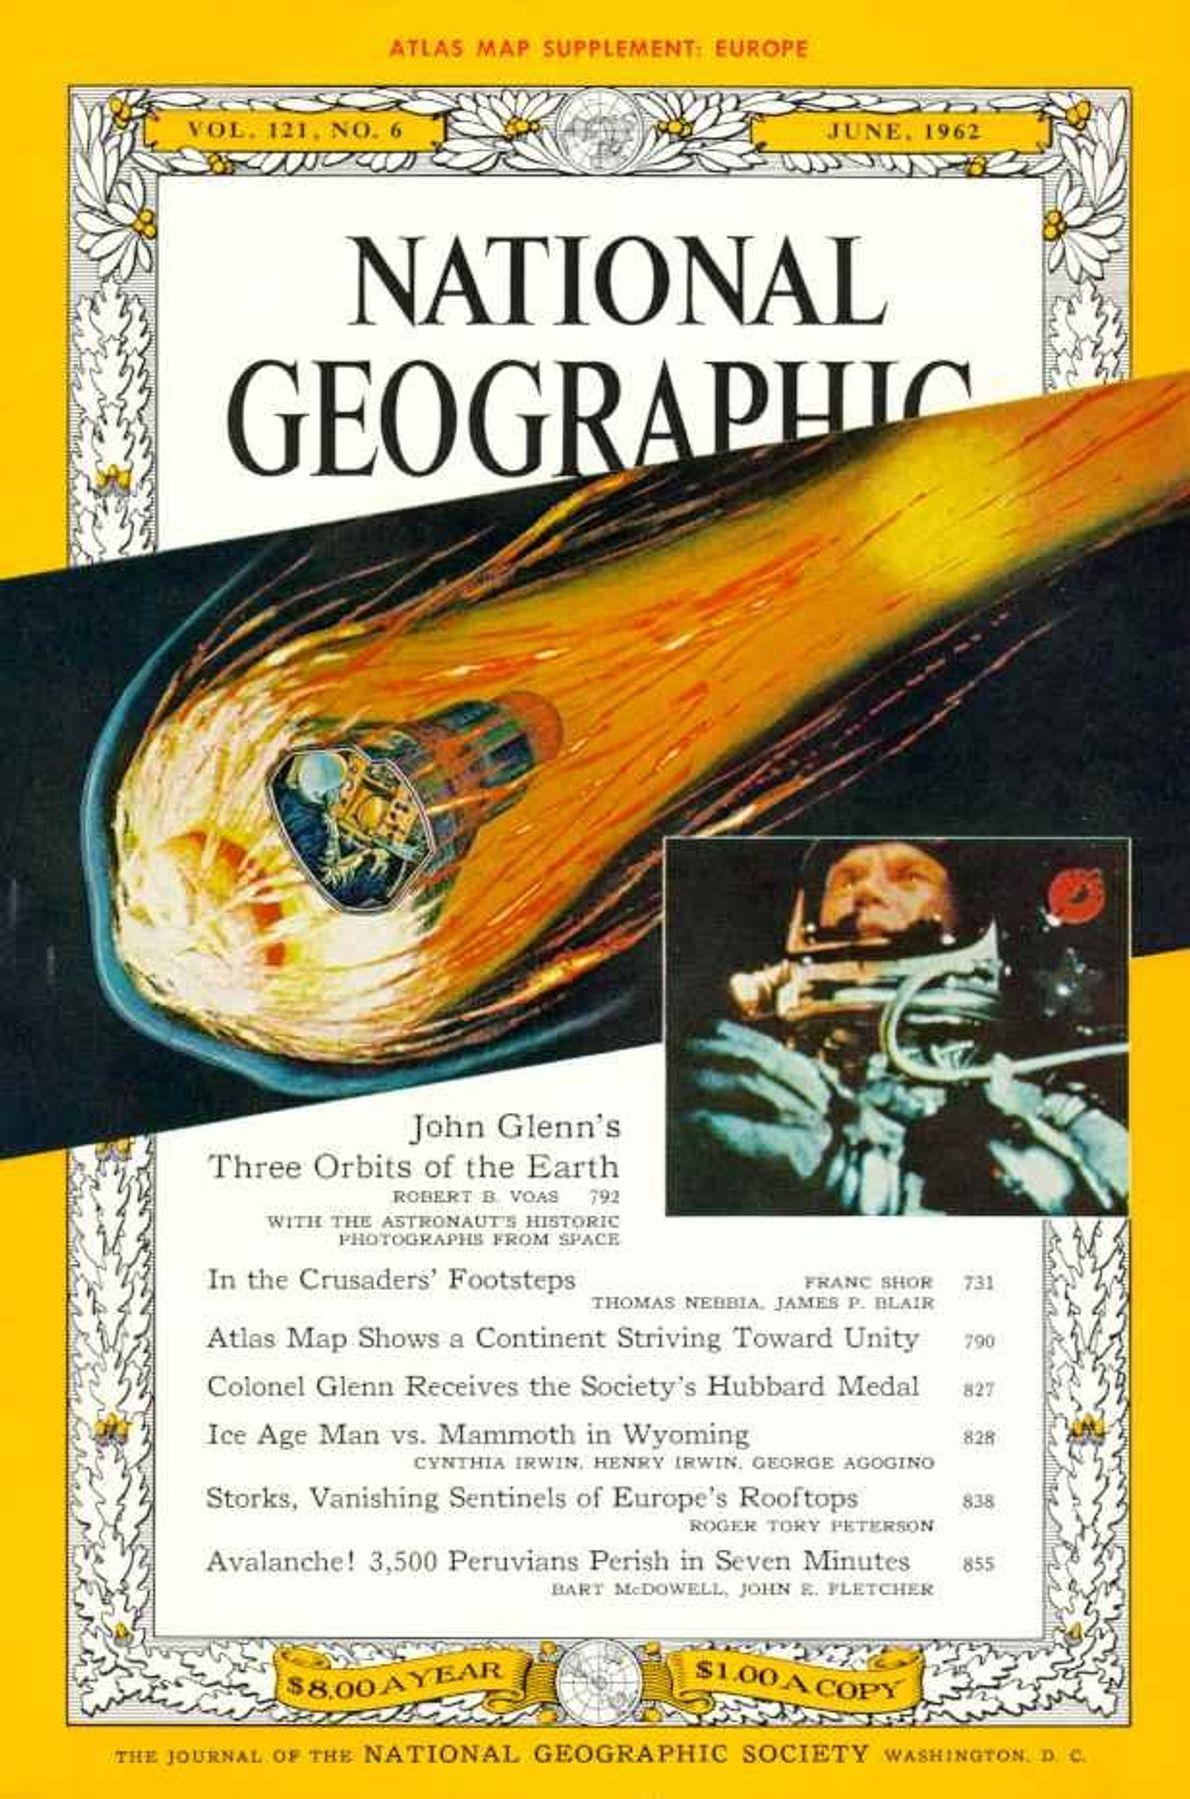 JUNHO DE 1962 — JOHN GLENN ORBITA A TERRA